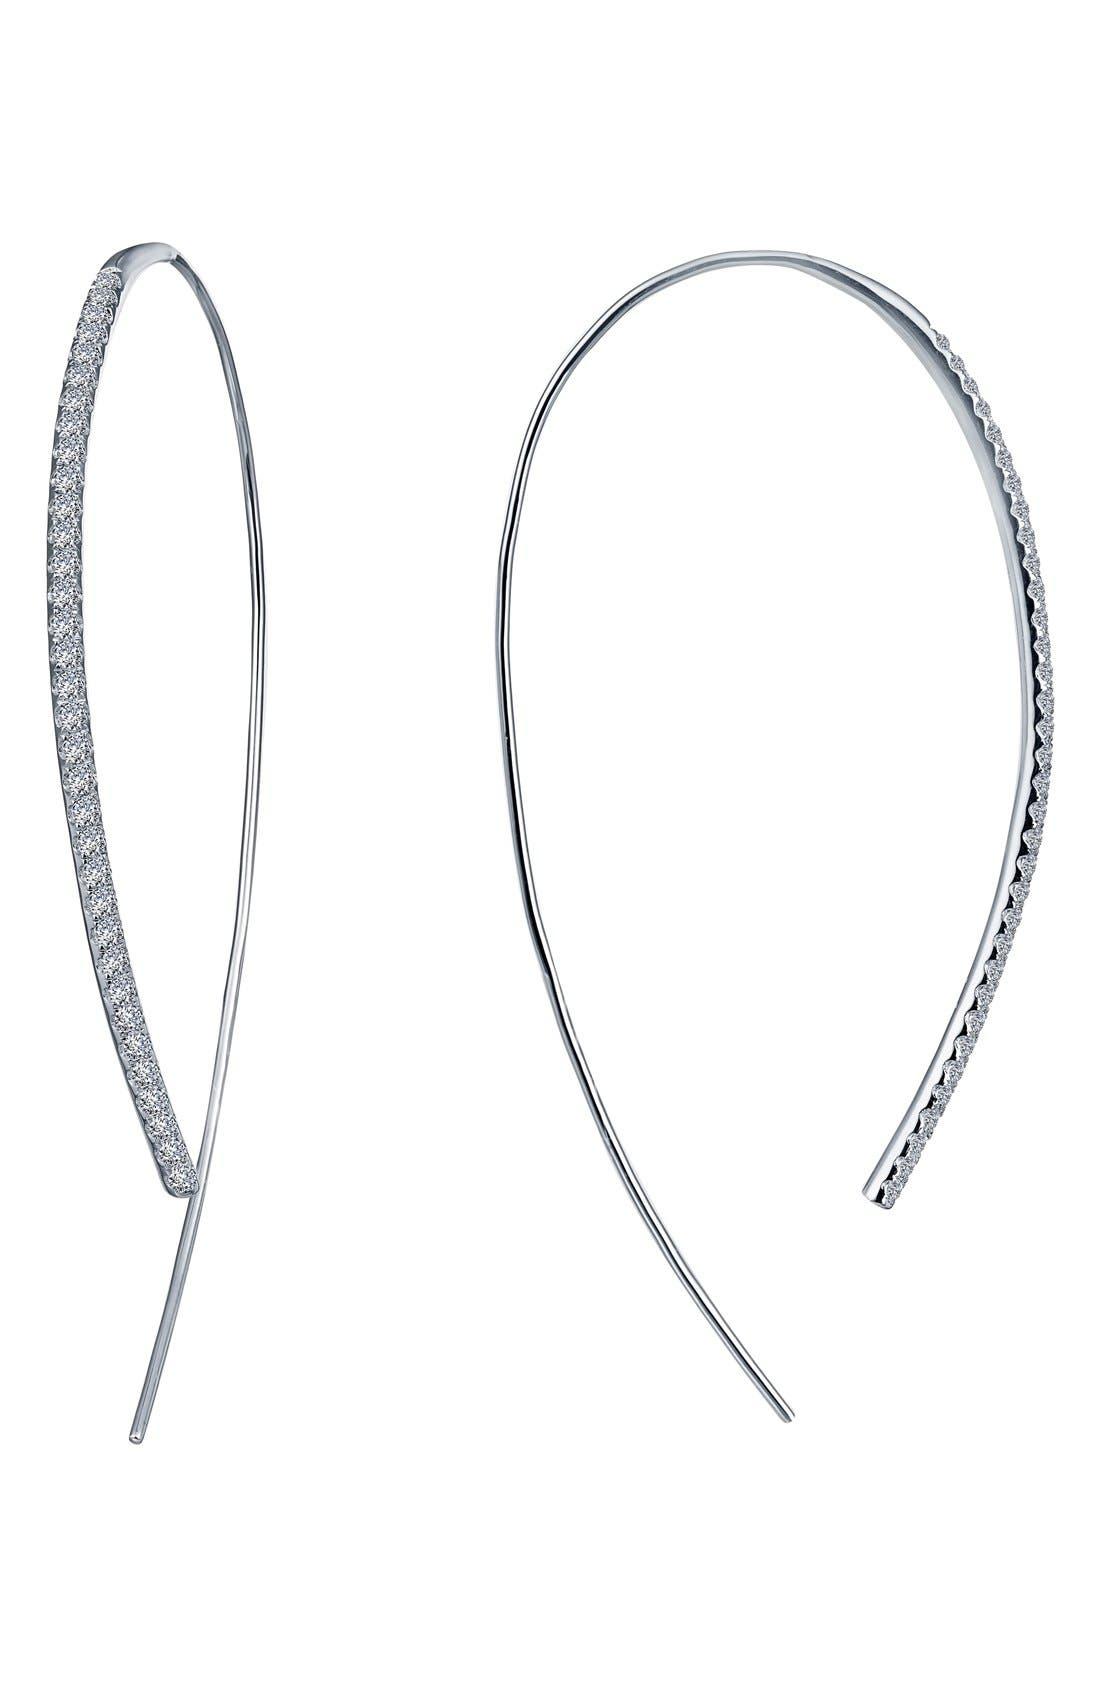 Open Hoop Threader Earrings,                         Main,                         color, Silver